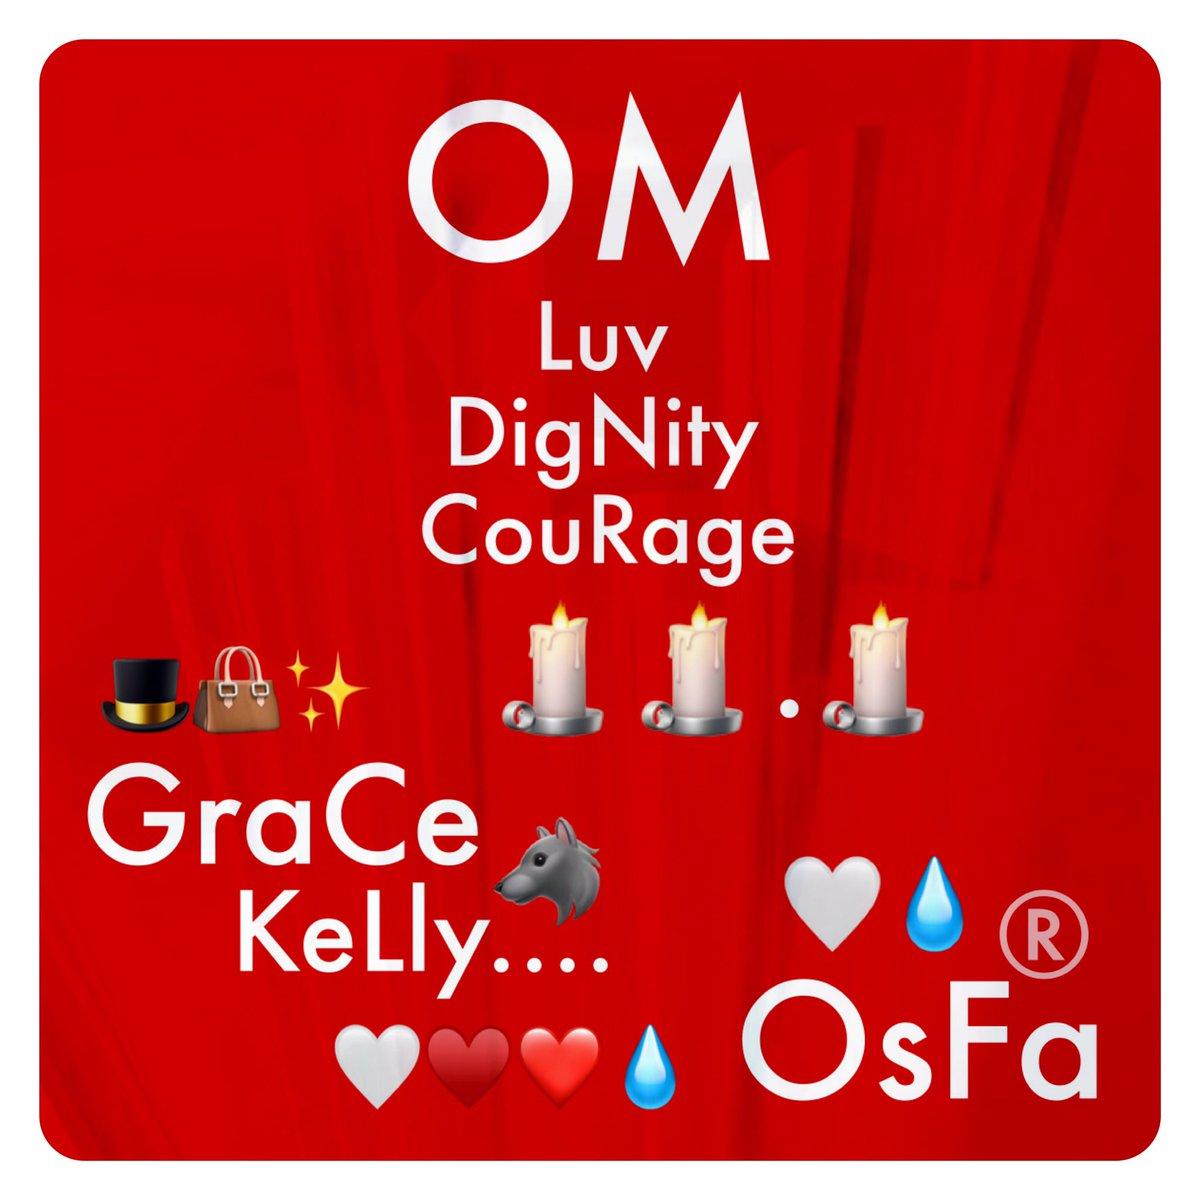 "#OM 👊❤️👍.. ..🕯🕯.🕯 ""...I tried #To_BE liKe #GraCe_KeLly🐺 👊🏼🤜🏼✨🌟✨🤛🏻👊🏻 I Could BE #brOwN, I could Be #BLue🦂 I CouLd bE #VioLeT_Sky🙏🏻 💥👊♥️mi PA #OjosBonitOS TeAMO #Óscar!!"" 🤍🤜🏼🤛🏻🤍 🤍♥️❤️💧 🎩👜✨ w #Luv #DigNity #CouRage #El_MagO #LObitO #OnicO #OMLegacy By #OsFa® 🤍💧"